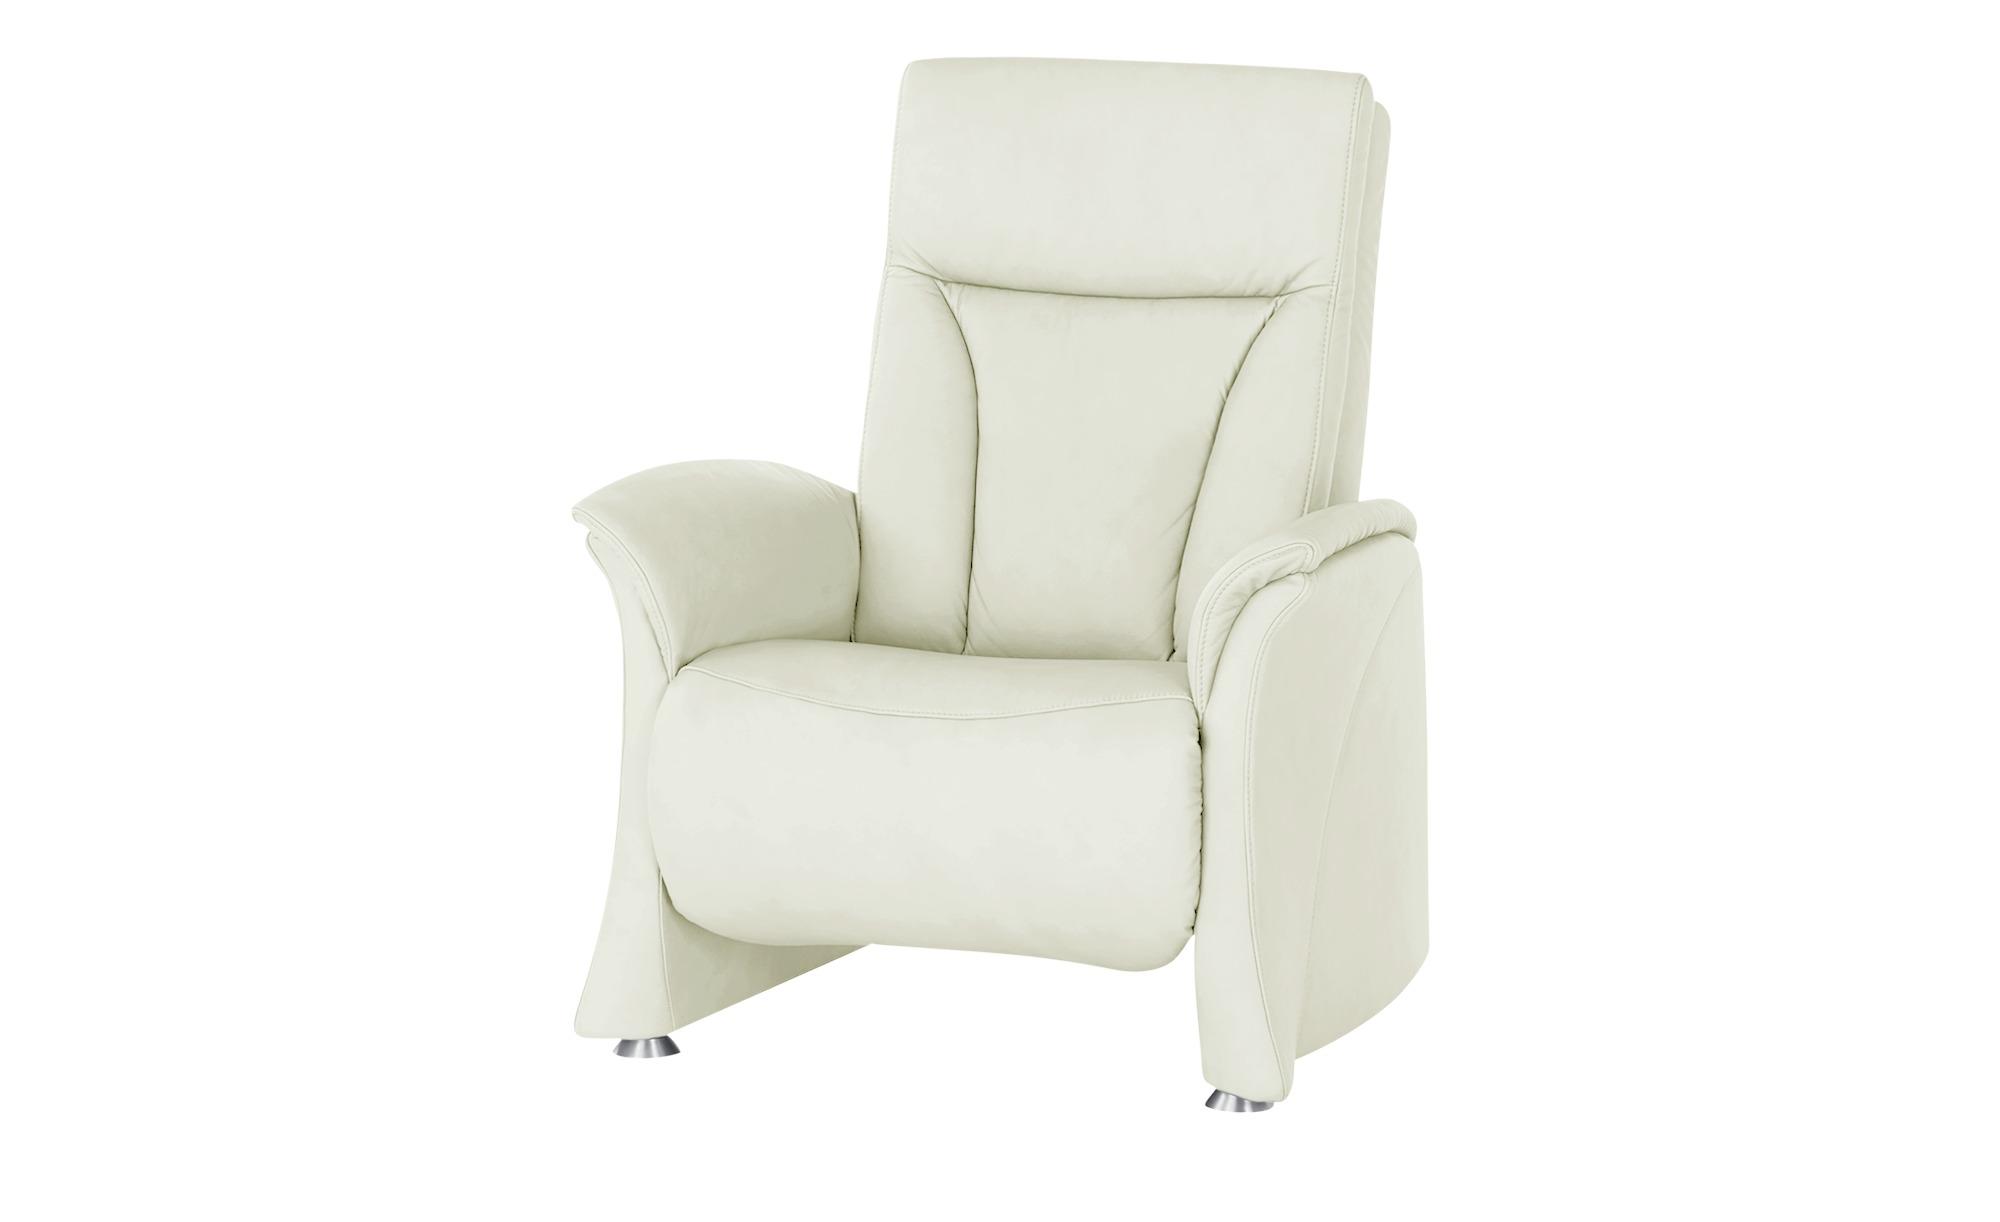 himolla Sessel  4010 ¦ creme ¦ Maße (cm): B: 75 H: 108 T: 88 Polstermöbel > Sessel > Ledersessel - Höffner